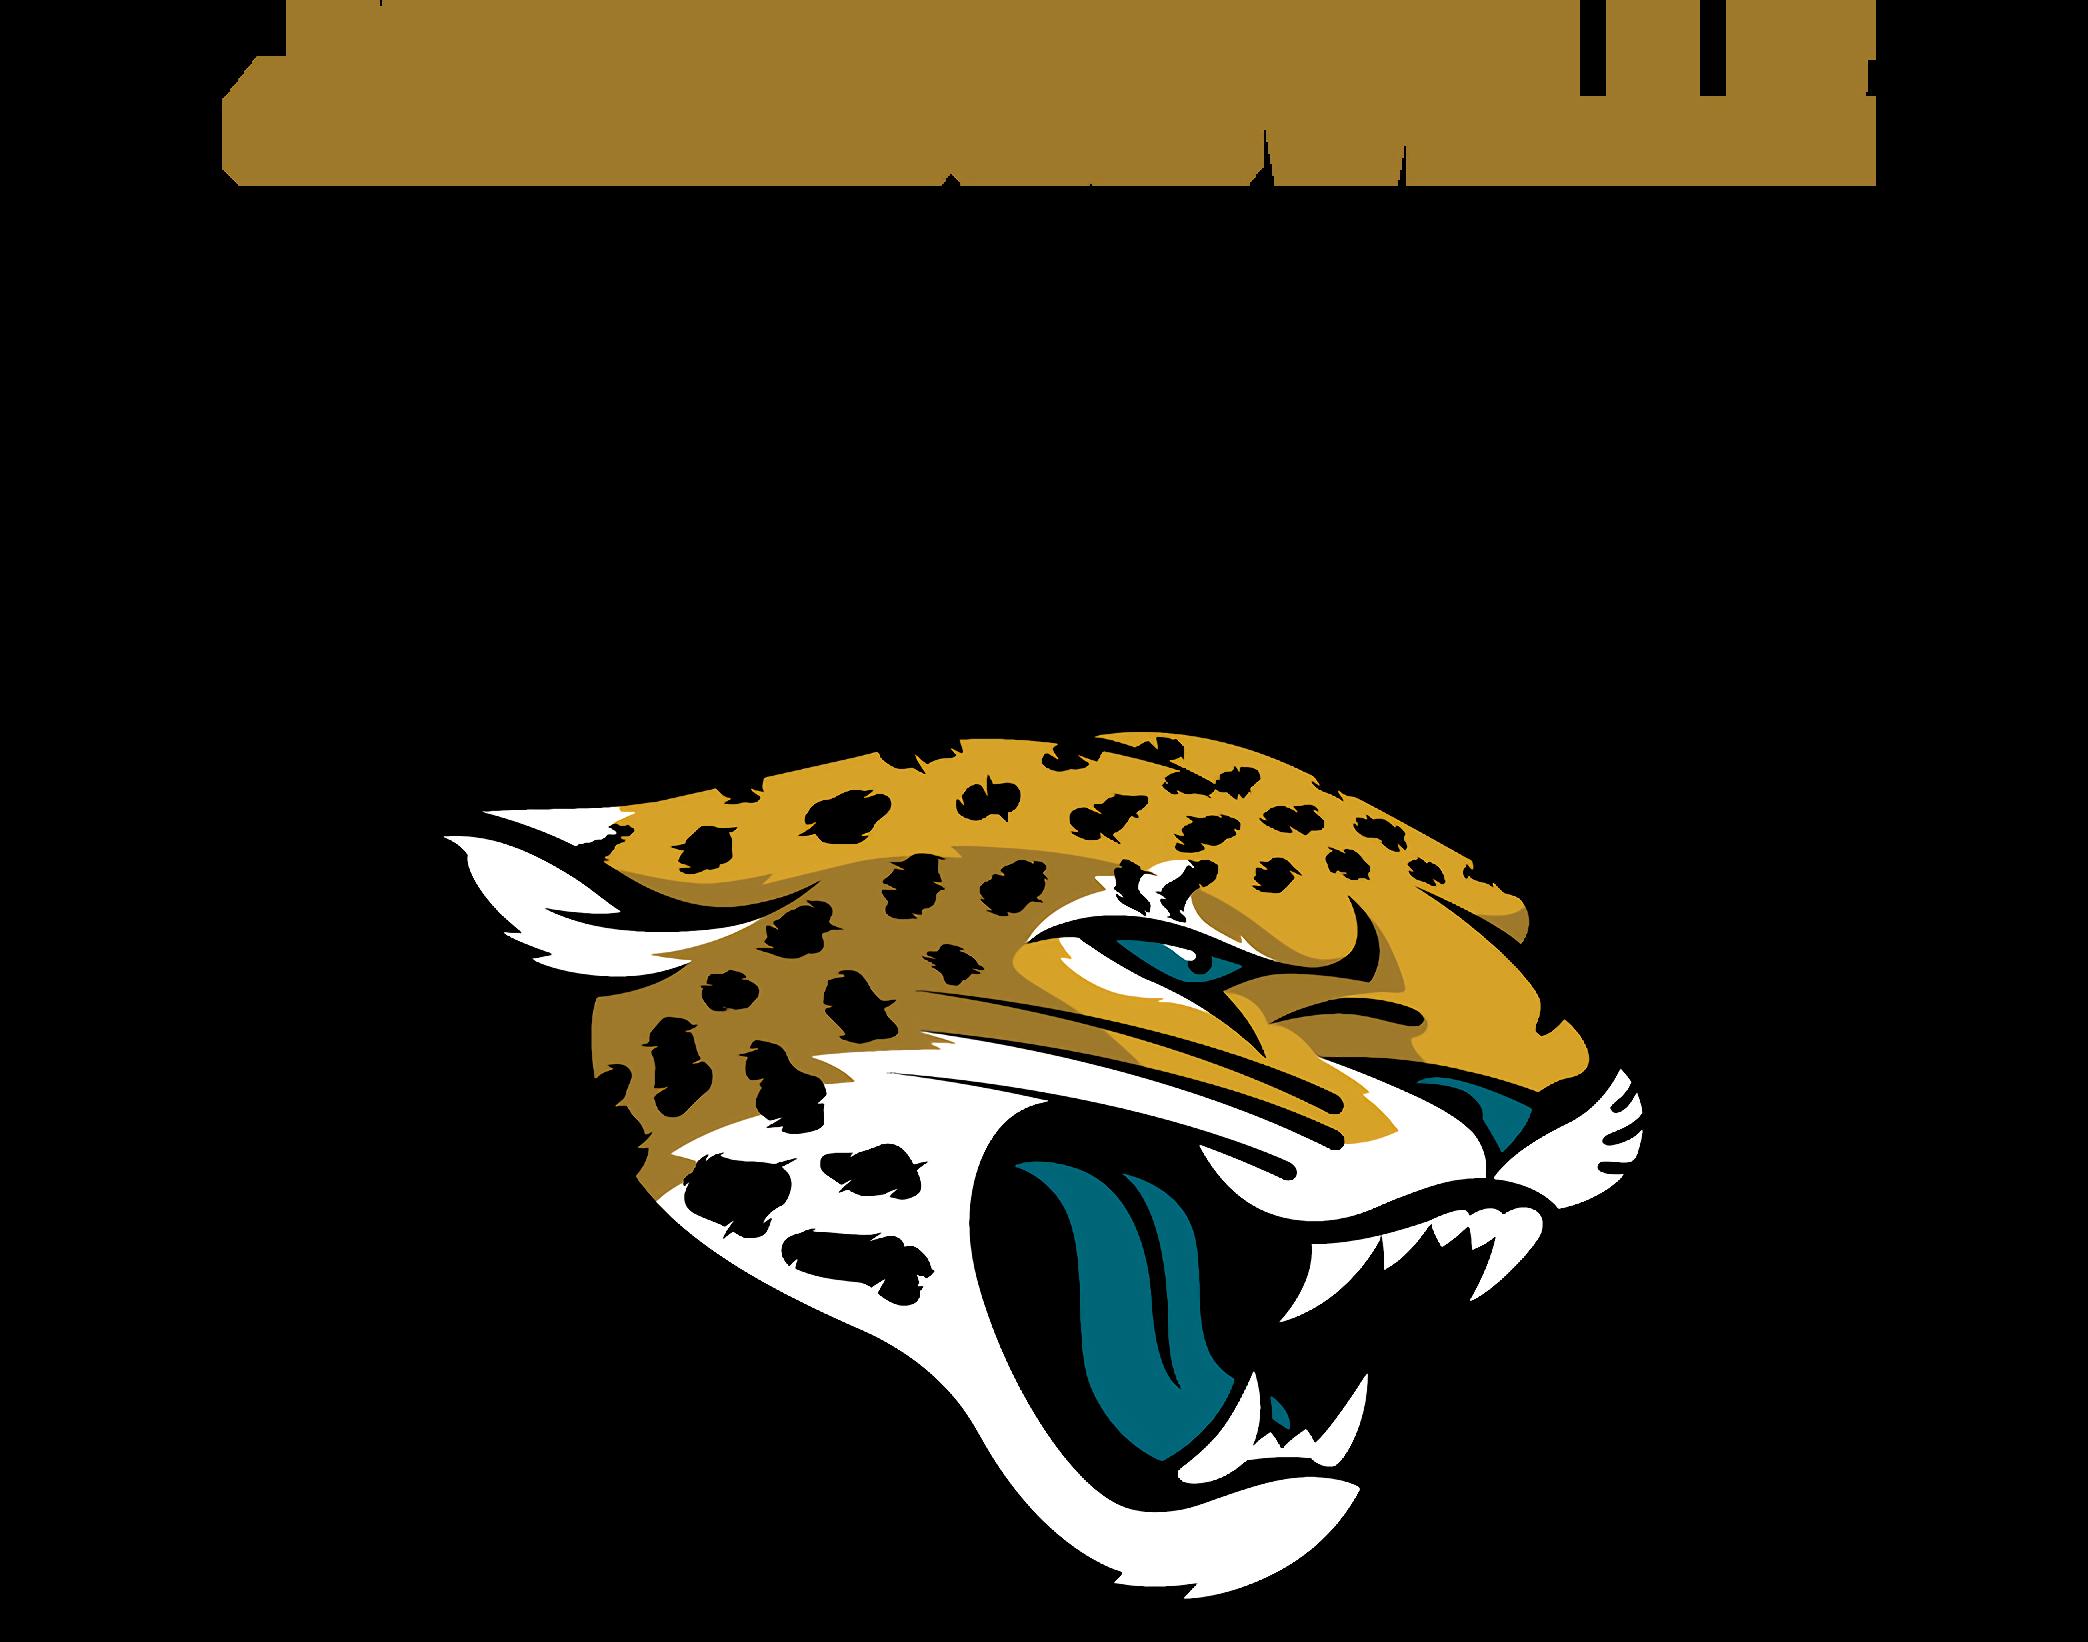 Jaguar football clipart jpg 1 Jacksonville Jaguars HD Wallpapers | Background Images - Wallpaper ... jpg